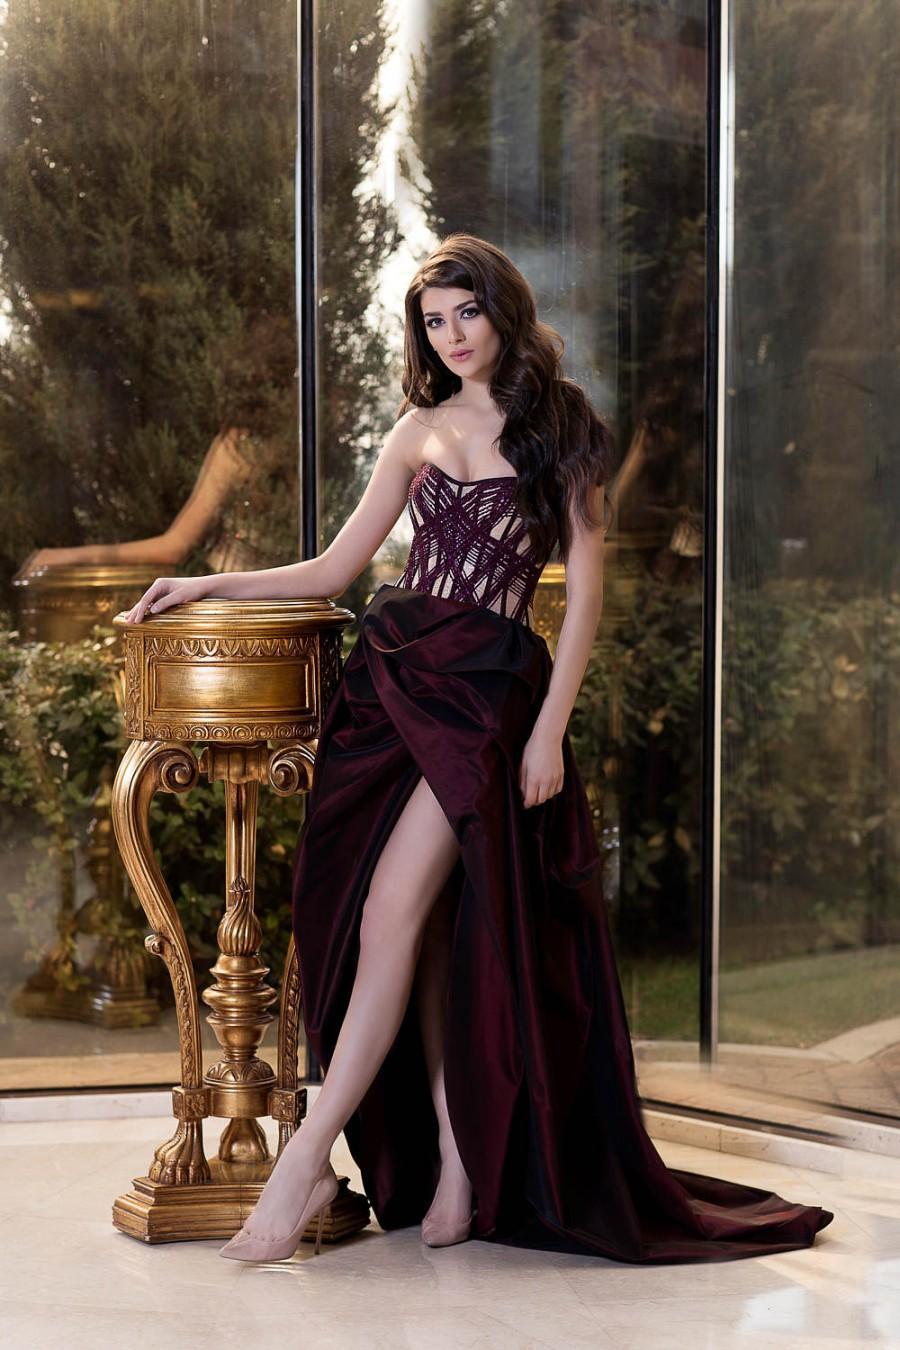 Wedding - Long Bridesmaid dress in Marsala color / Formal beaded dress Elegant taffeta dress Couture Sleeveless dress Prom Ball gown Evening dress